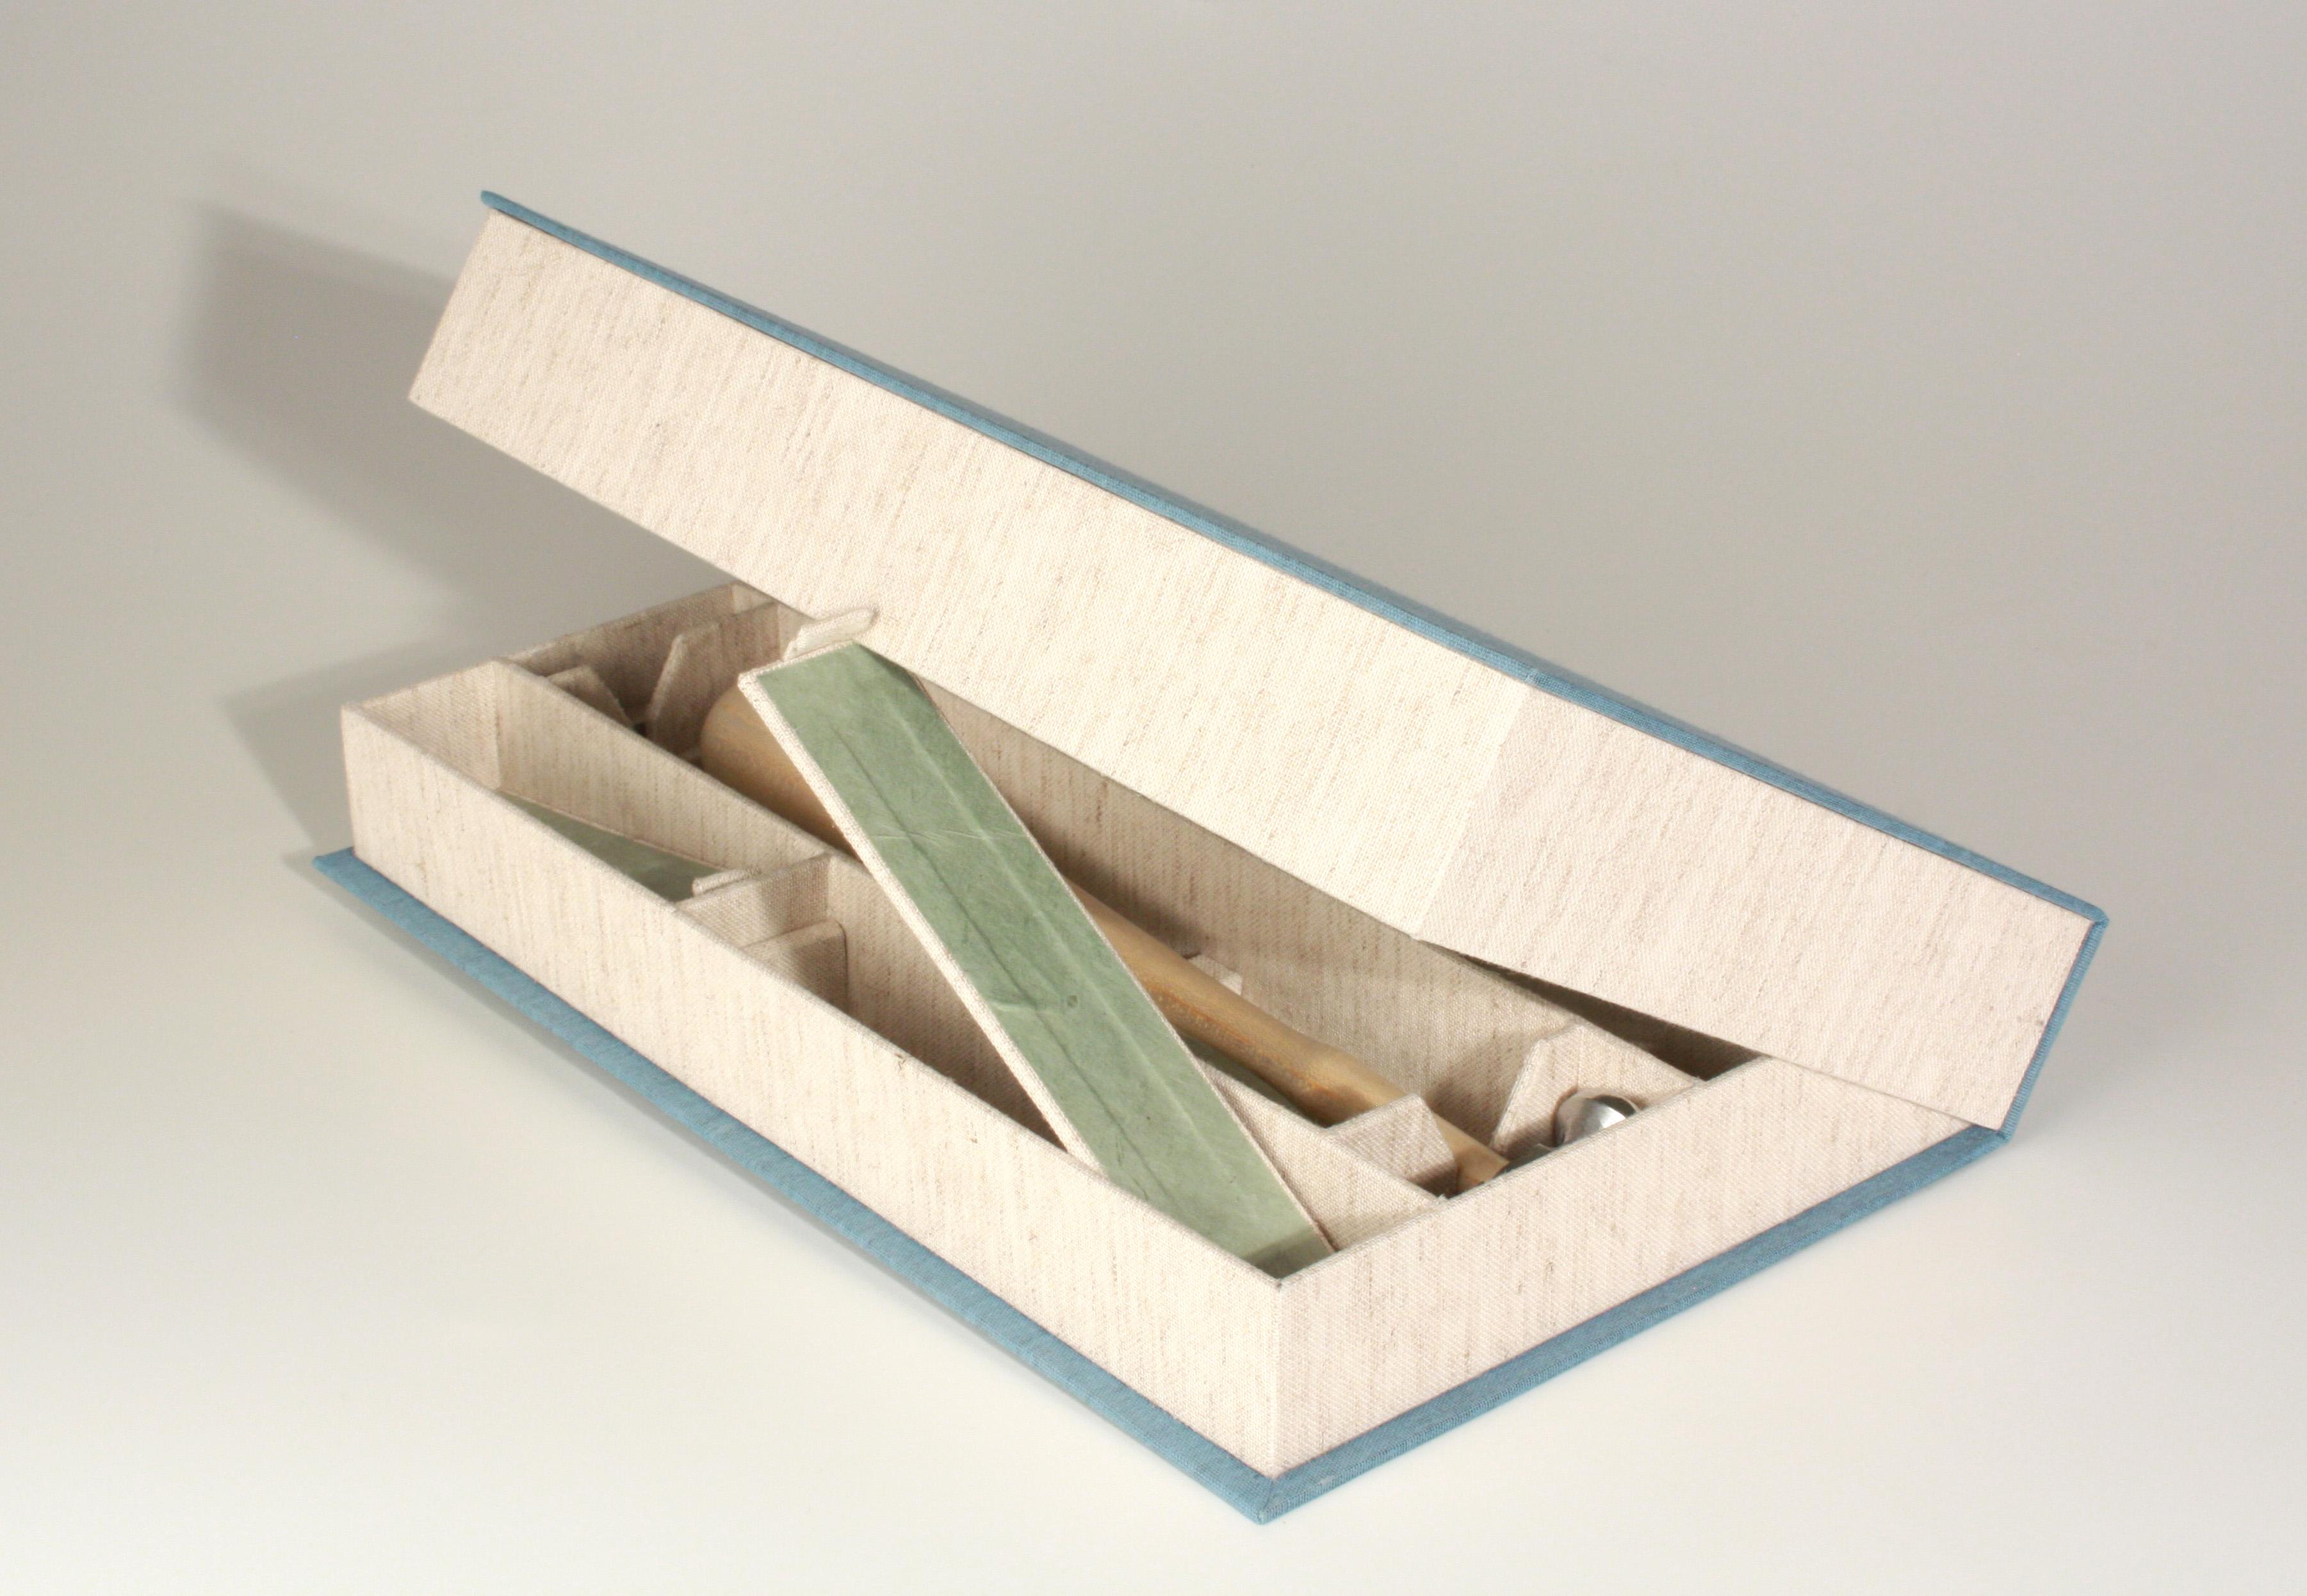 Clam-shell - Riveting Tools Box